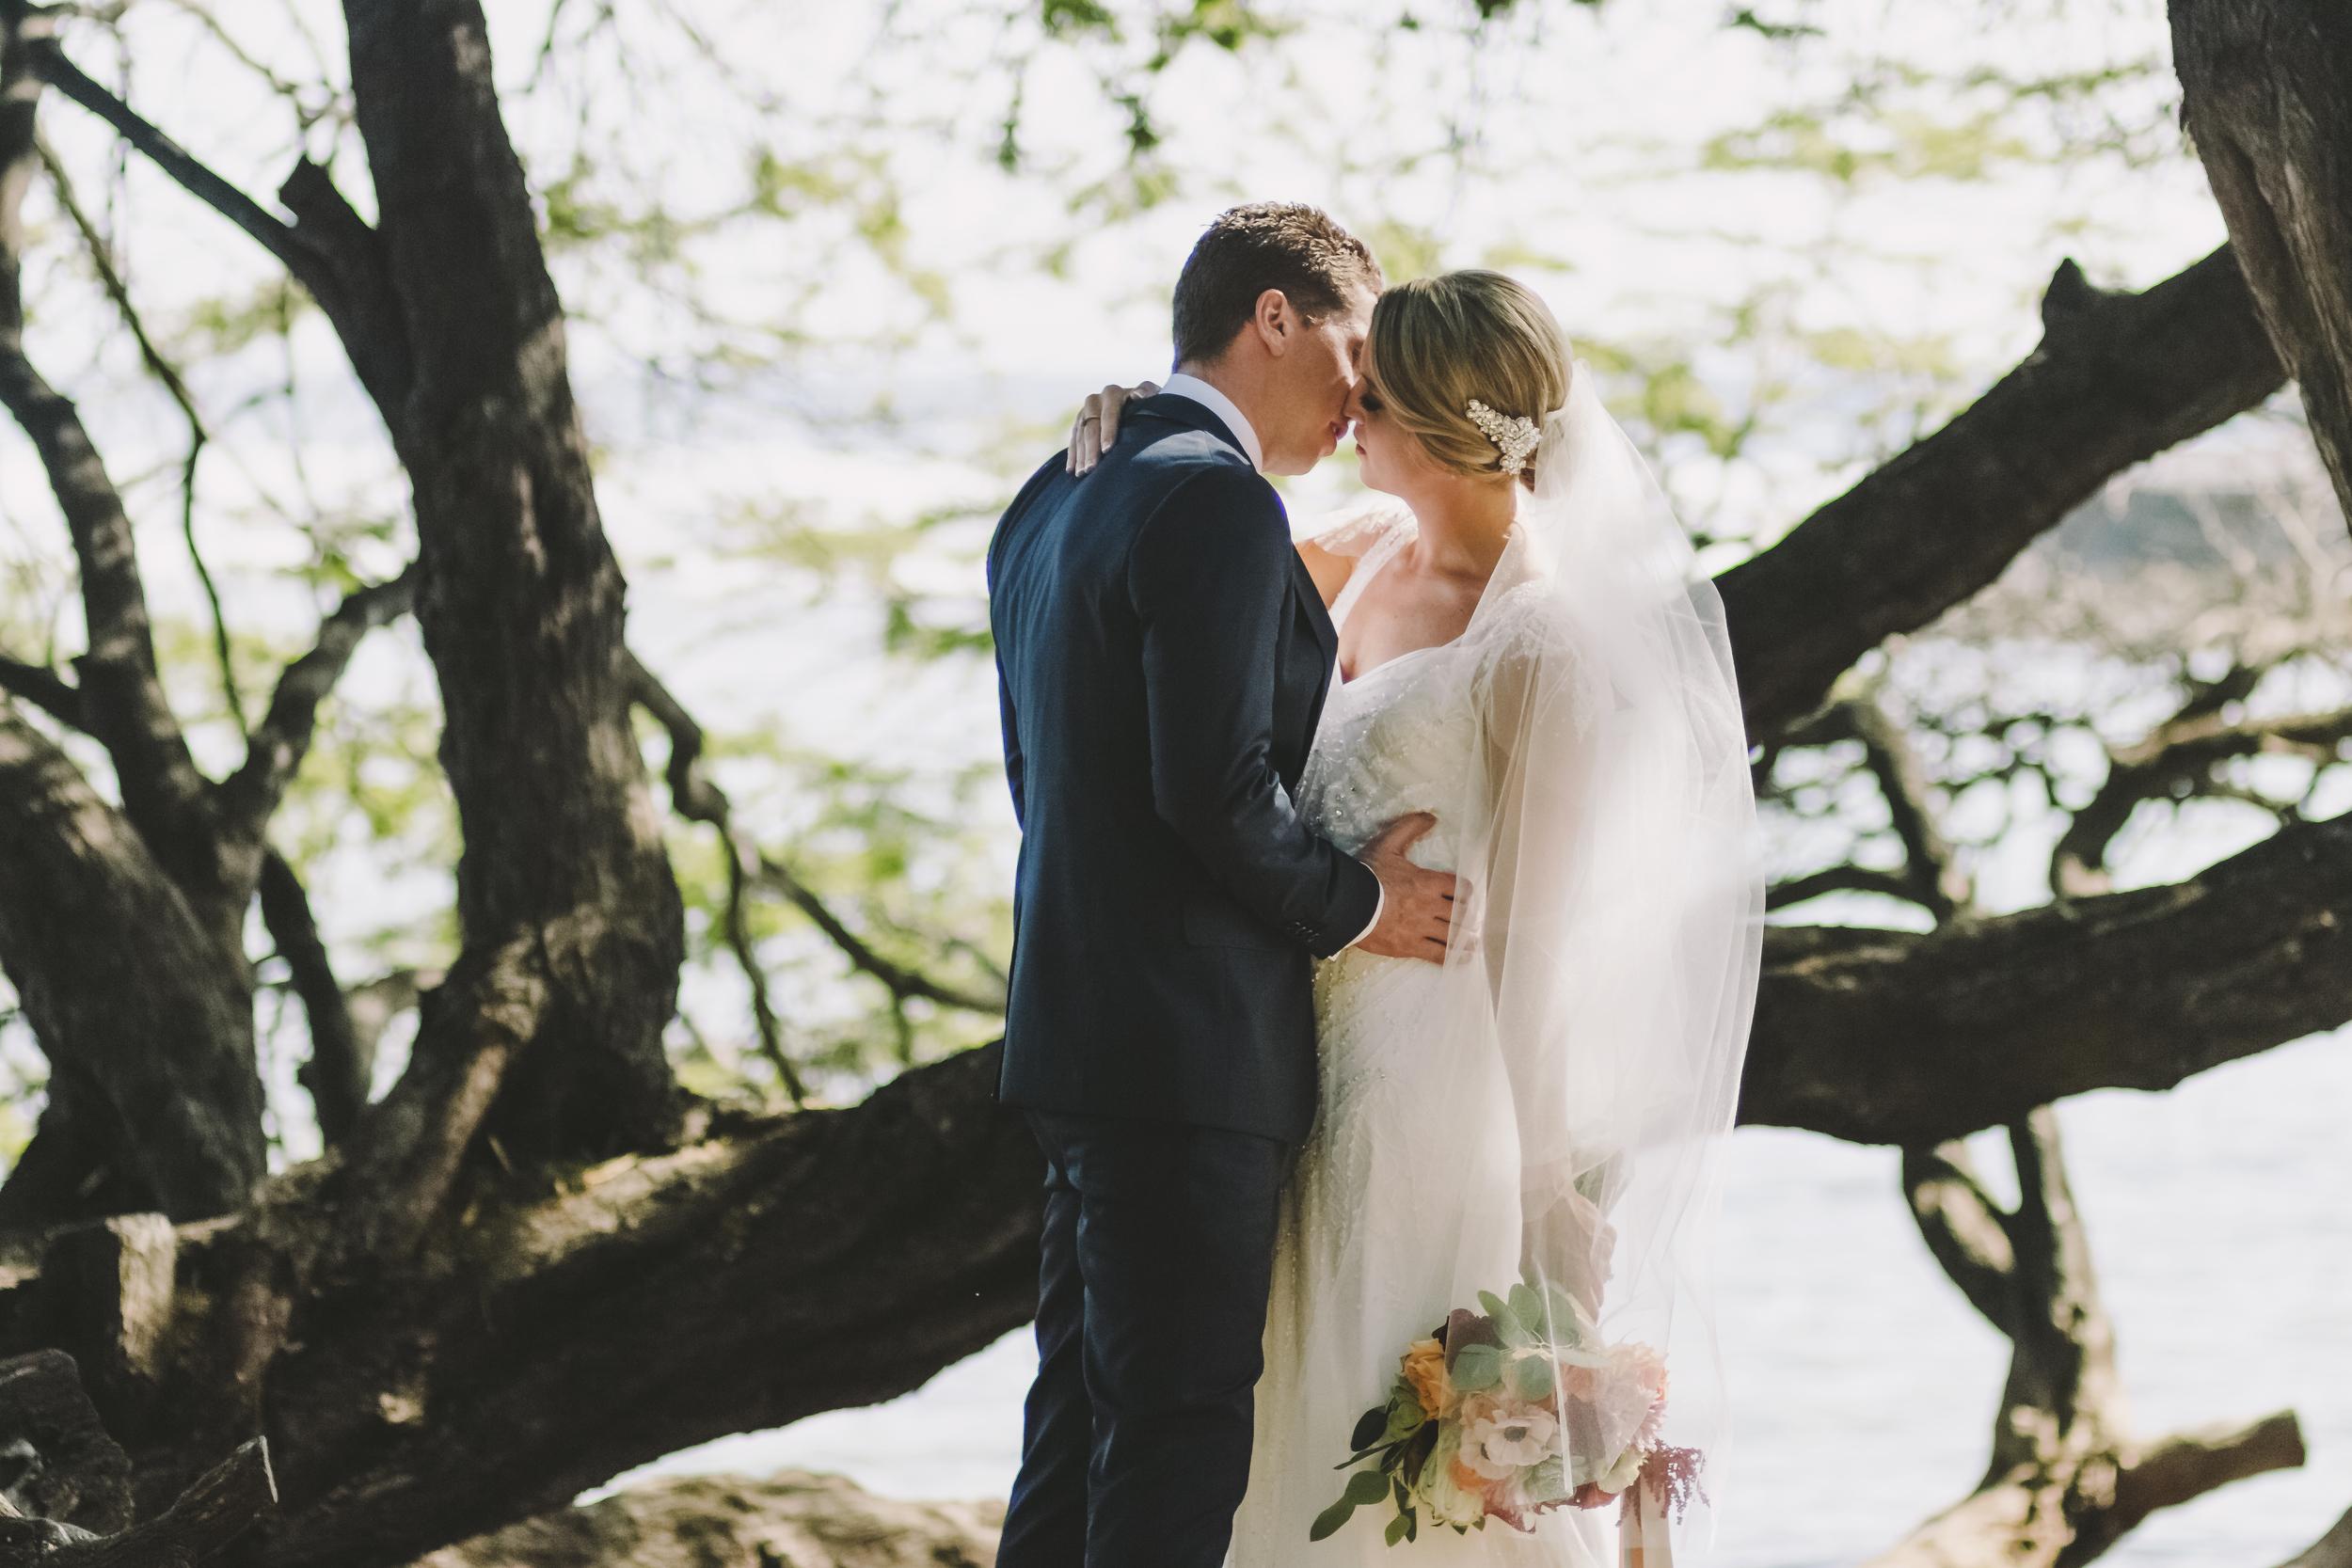 angie-diaz-photography-maui-wedding-mel-matt-52.jpeg